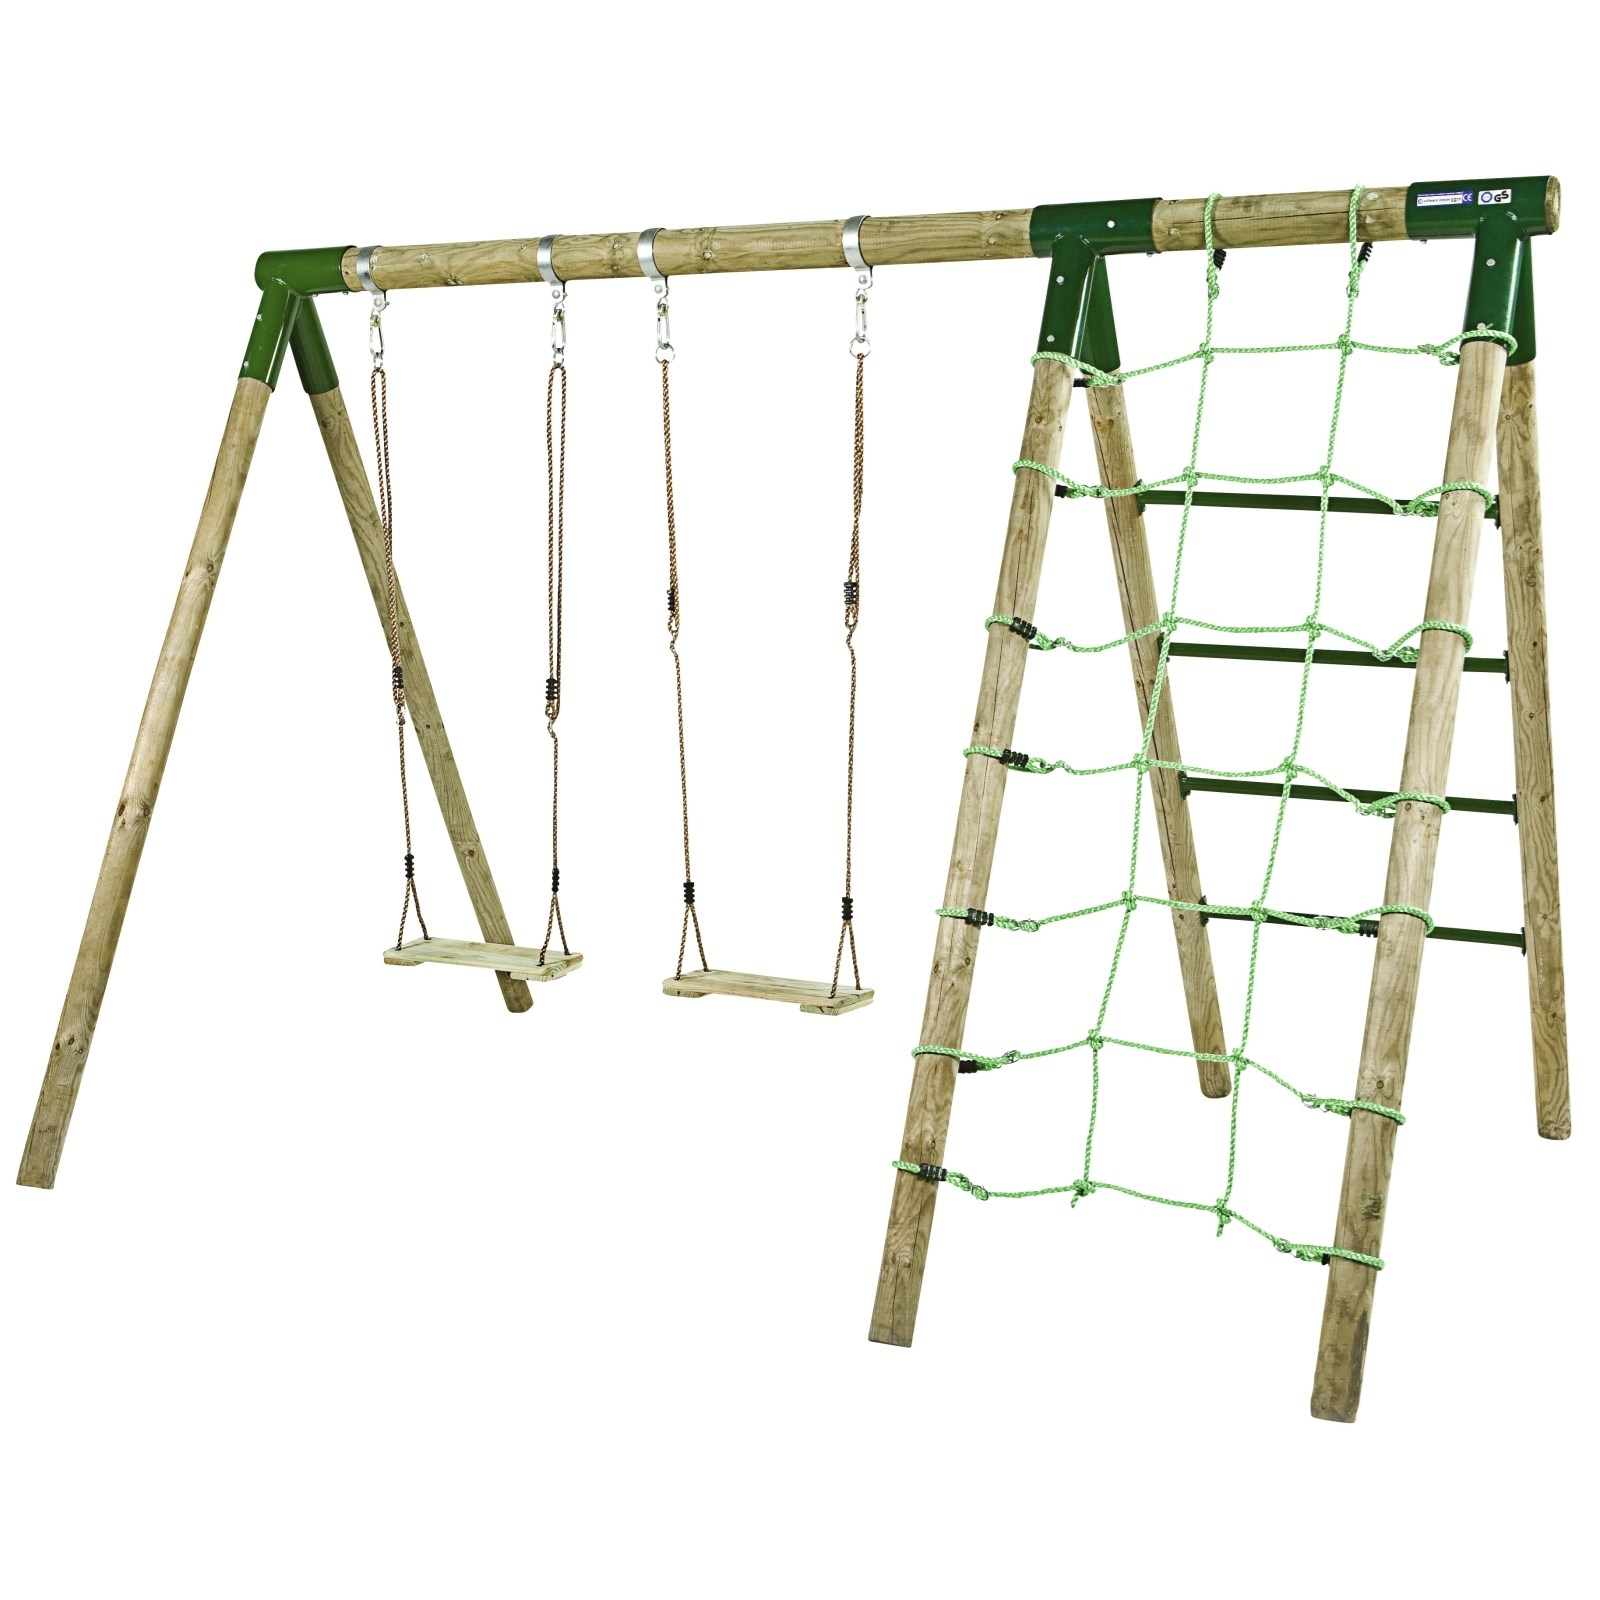 Hervorragend Kinderschaukel Holz 295 × 200 cm - Kinderspielzeug Outdoor - LANDI CU79